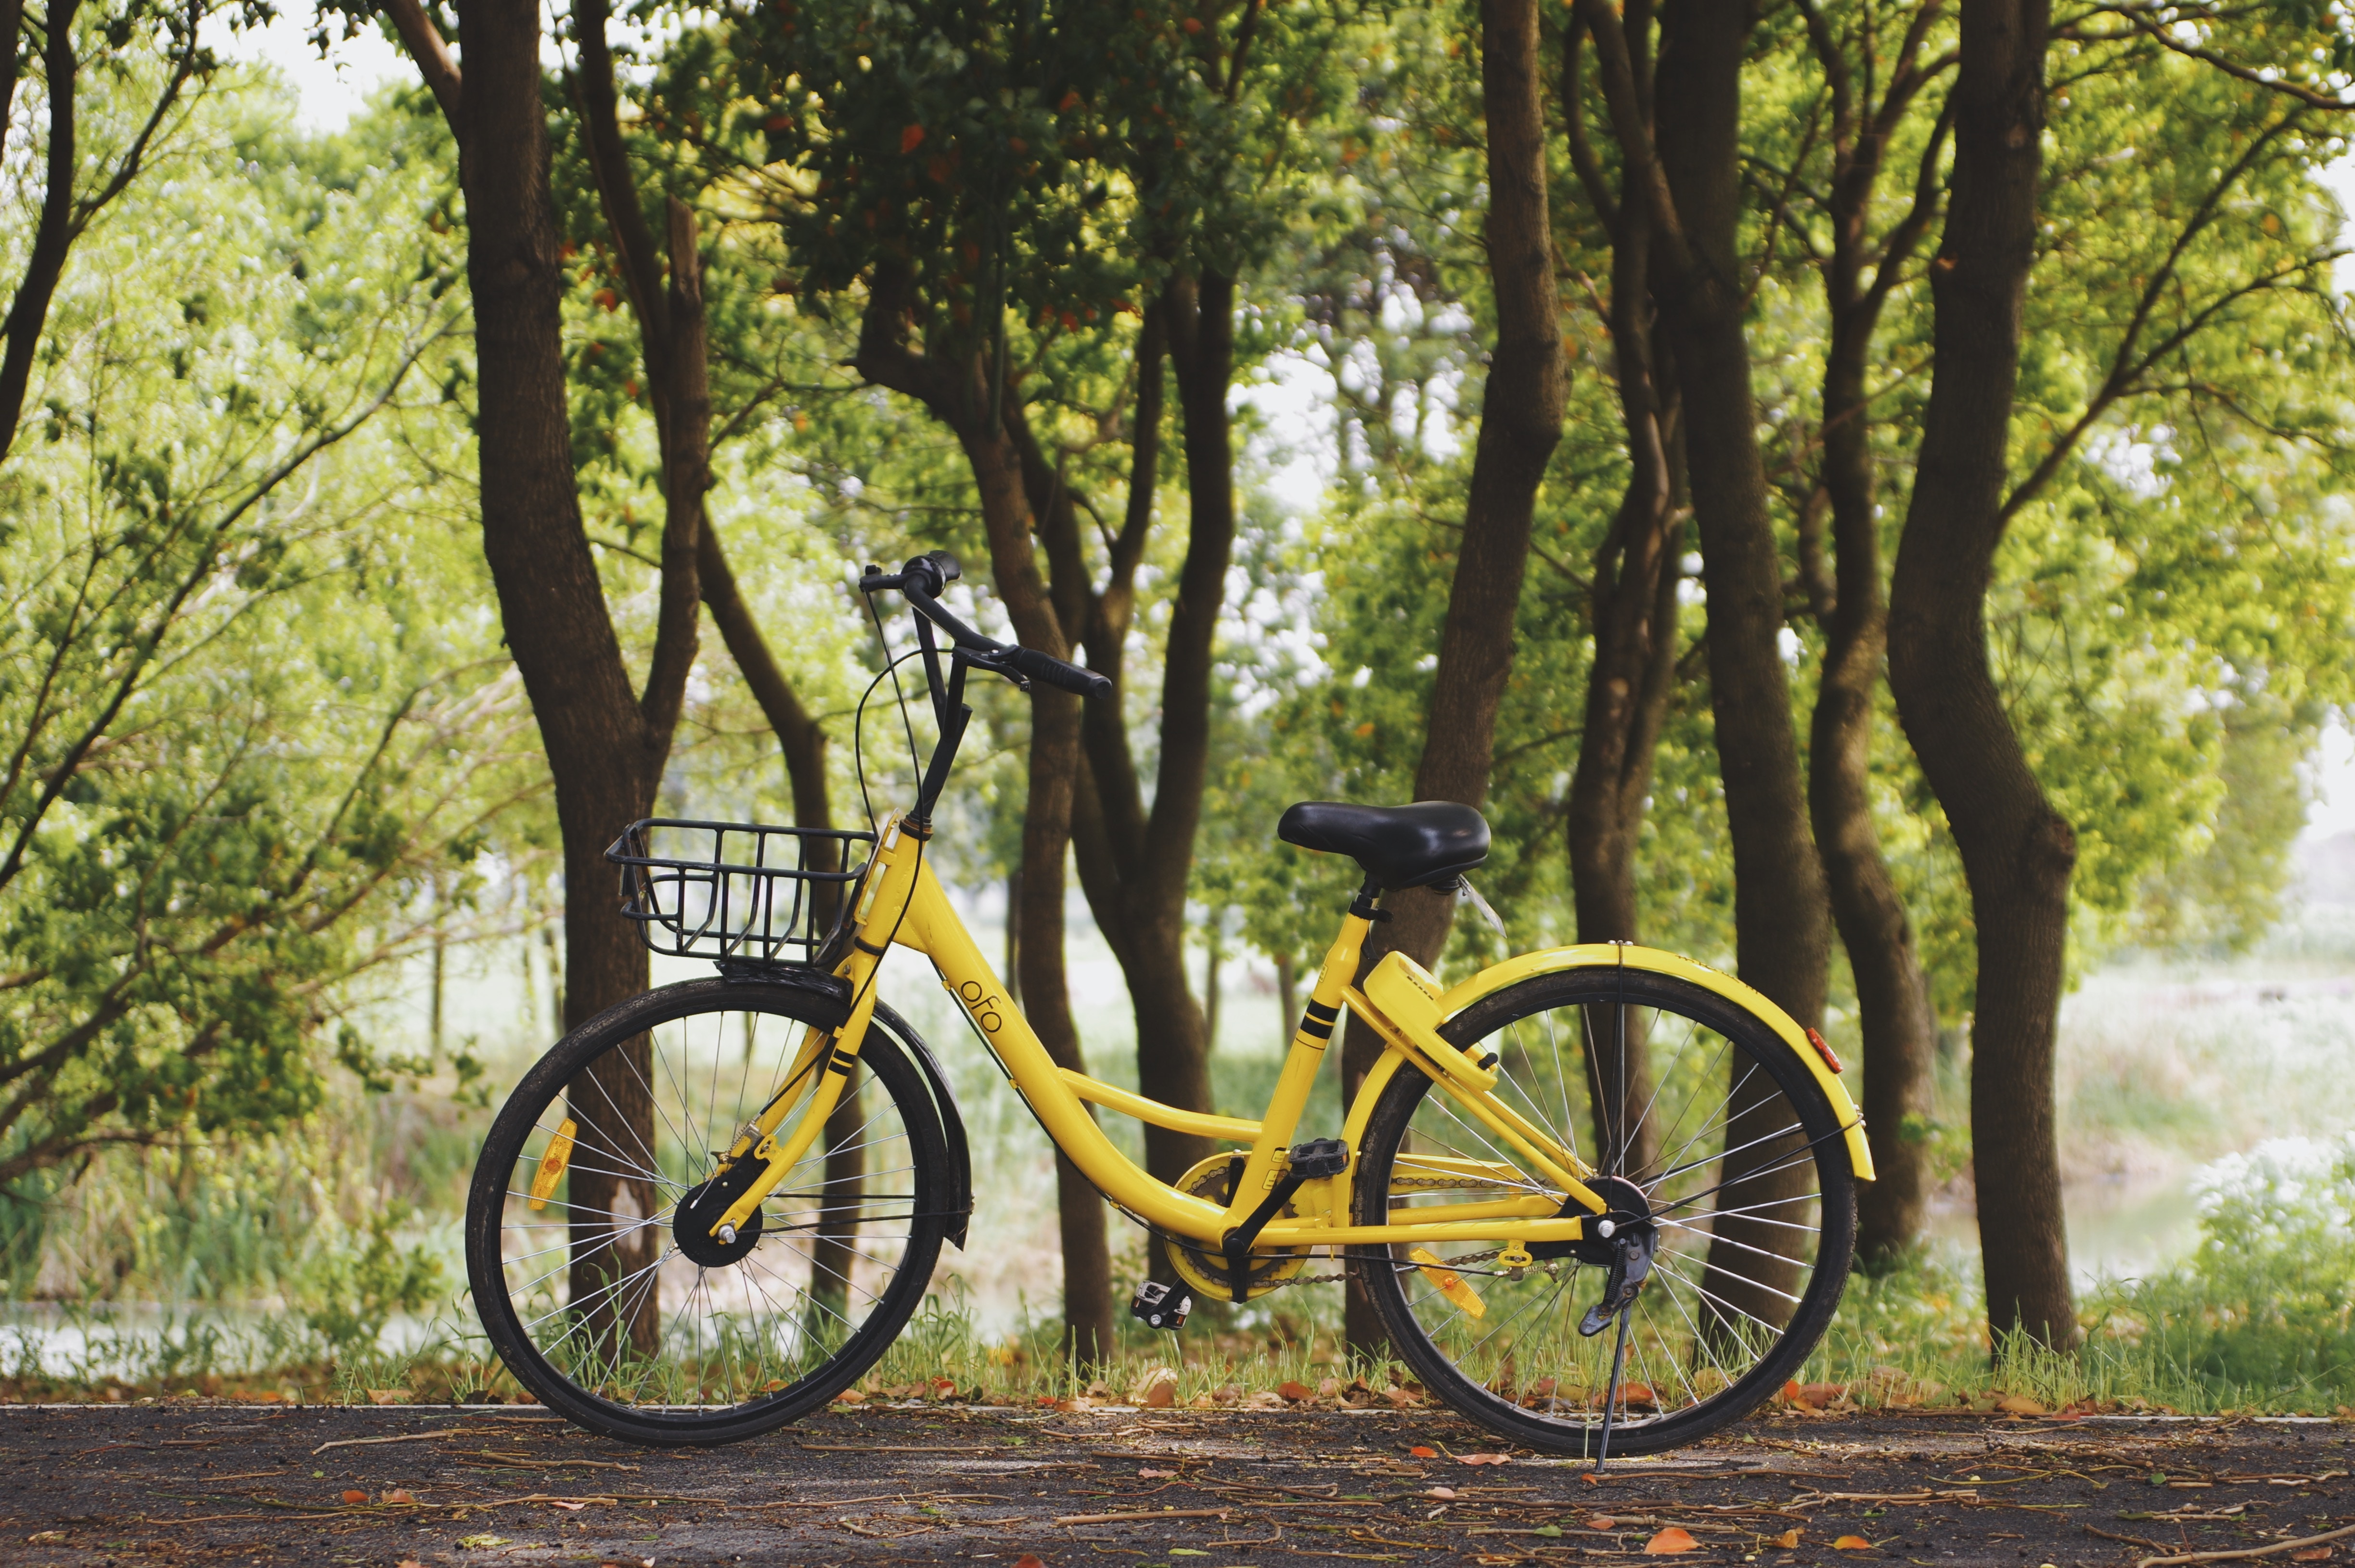 8 Benefits Of Using Electric Bikes - Peak Adventures Blog